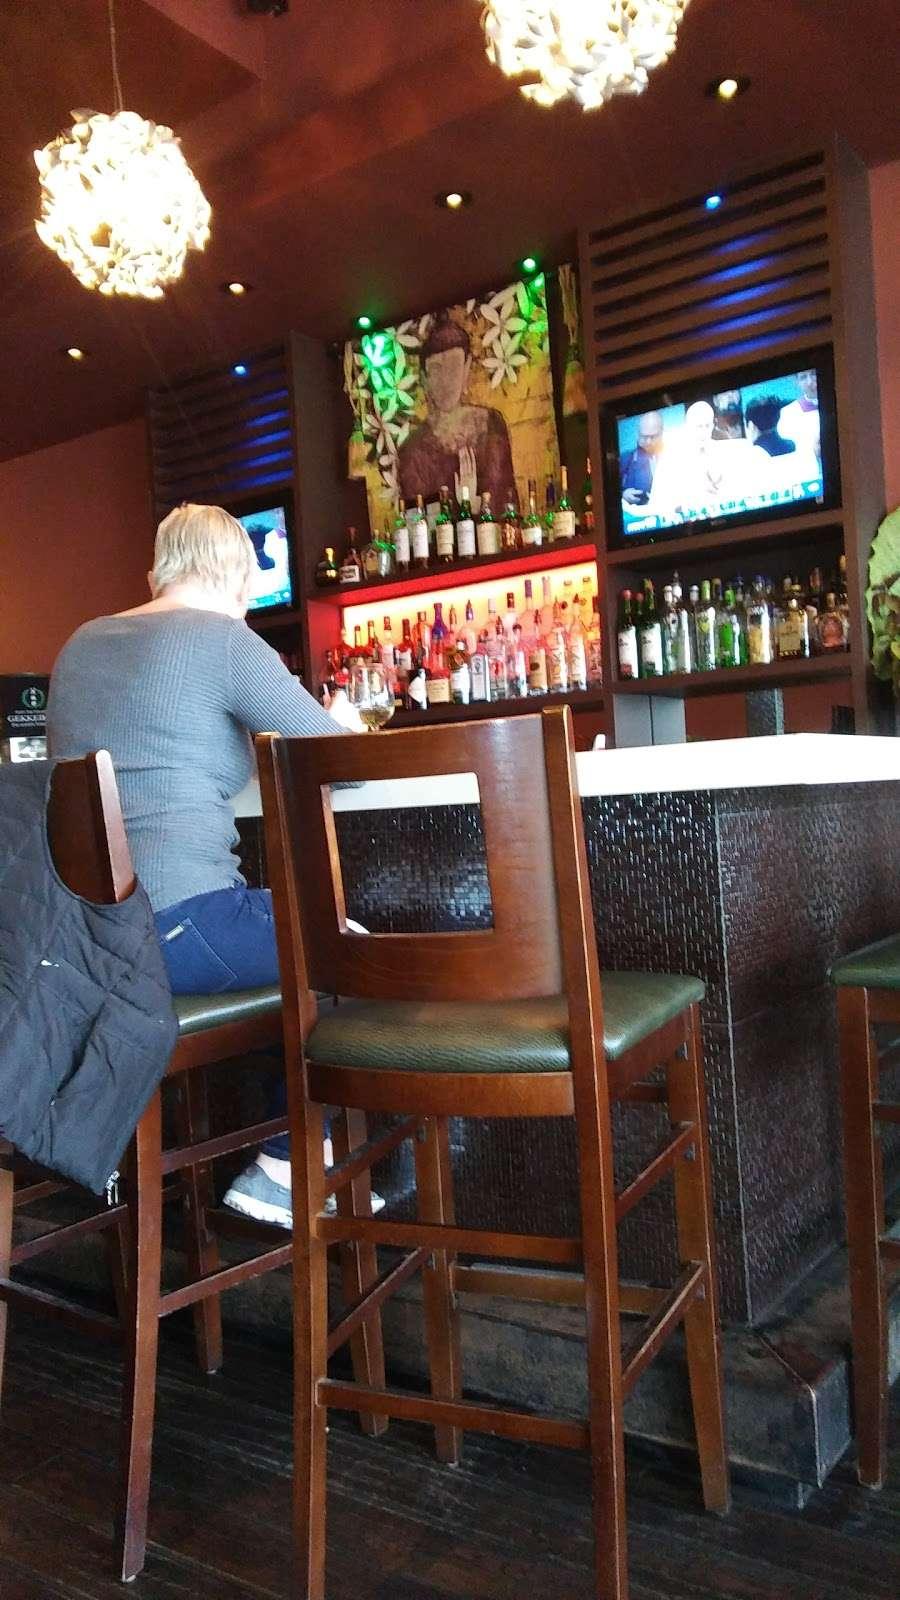 Haiku Asian Bistro - restaurant  | Photo 1 of 10 | Address: 717 White Plains Rd, Scarsdale, NY 10583, USA | Phone: (914) 722-4200